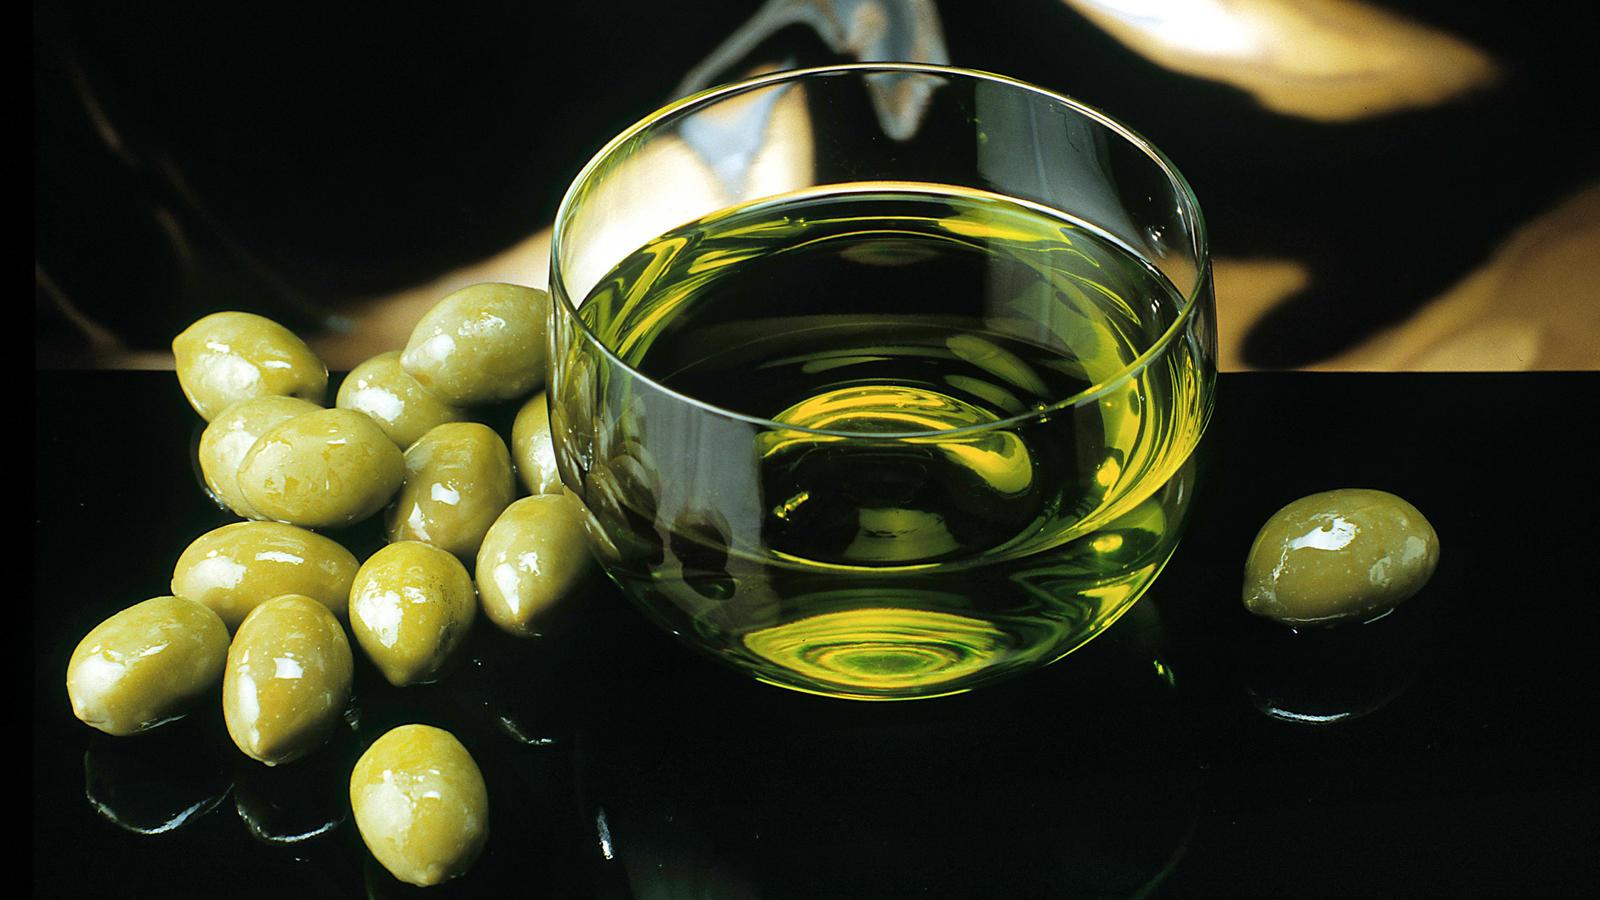 kaltgepresstes oliven l deshalb besser nicht stark erhitzen. Black Bedroom Furniture Sets. Home Design Ideas